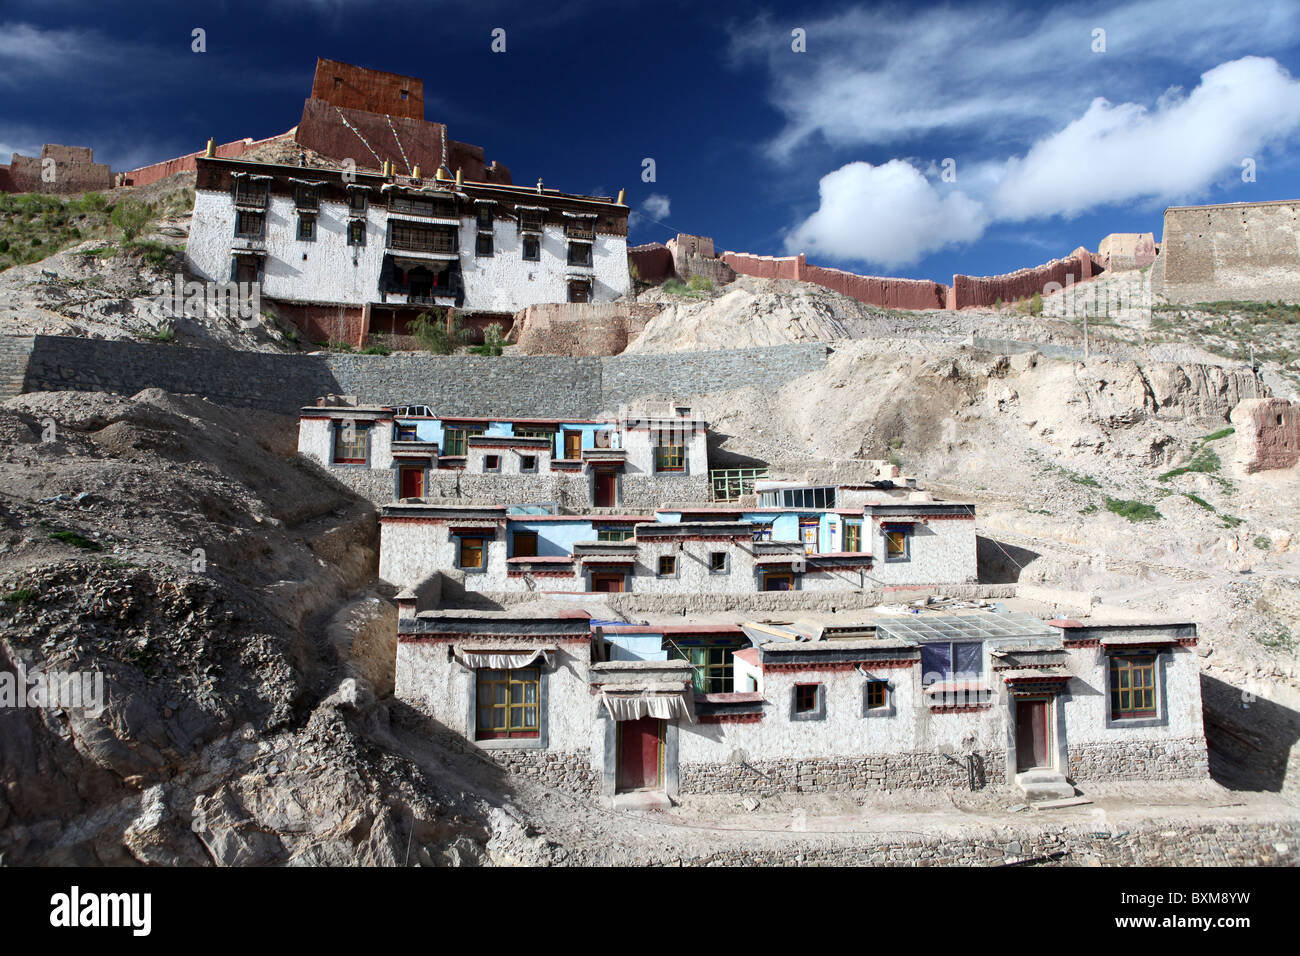 Part of the Shigatse Pelkhor Choede, Palcho Monastery in Gyantse, Tibet, China. Stock Photo